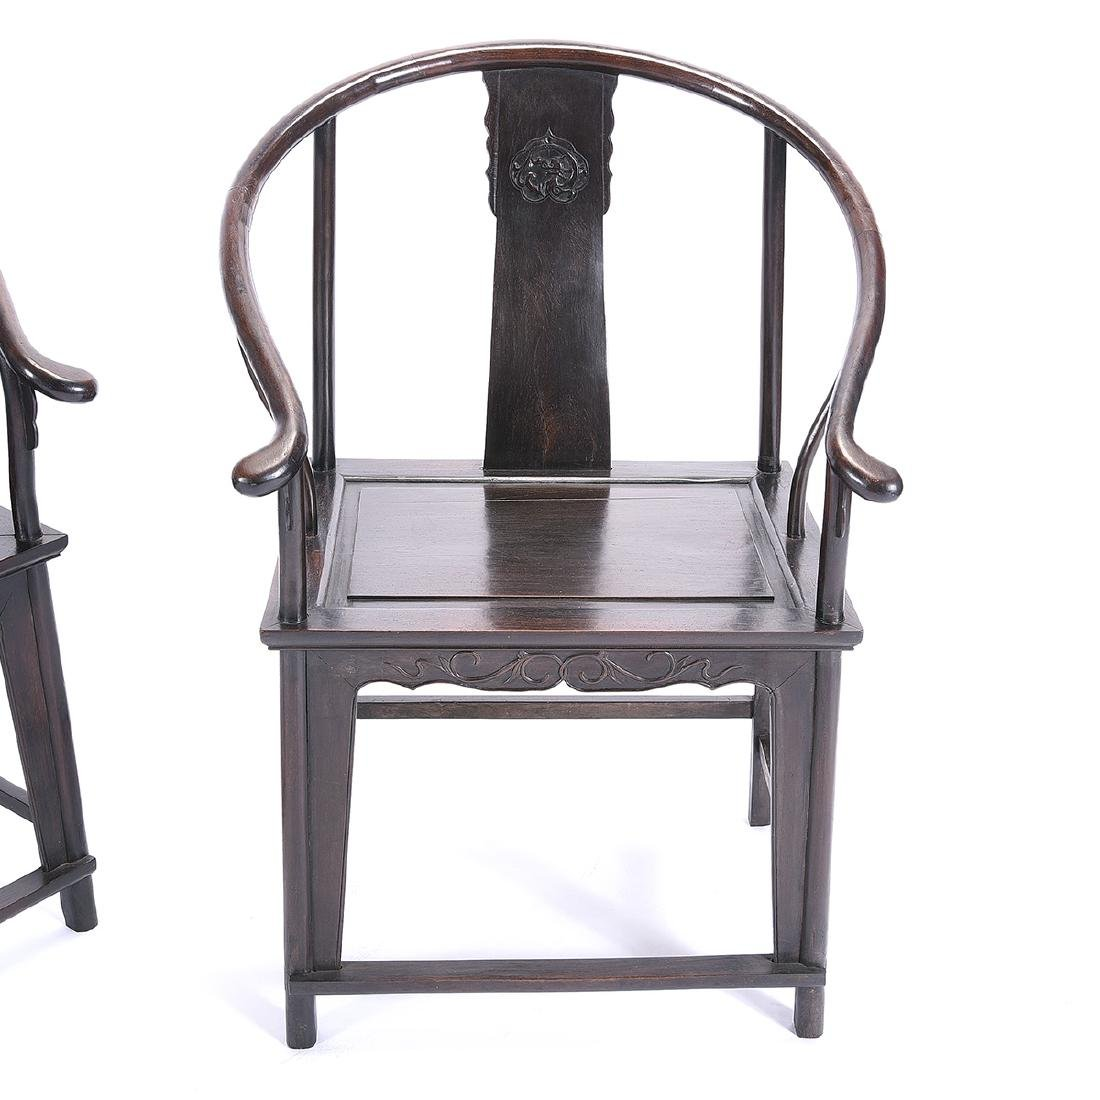 Pr of Zitan Horseshoe-Back Armchairs - 2